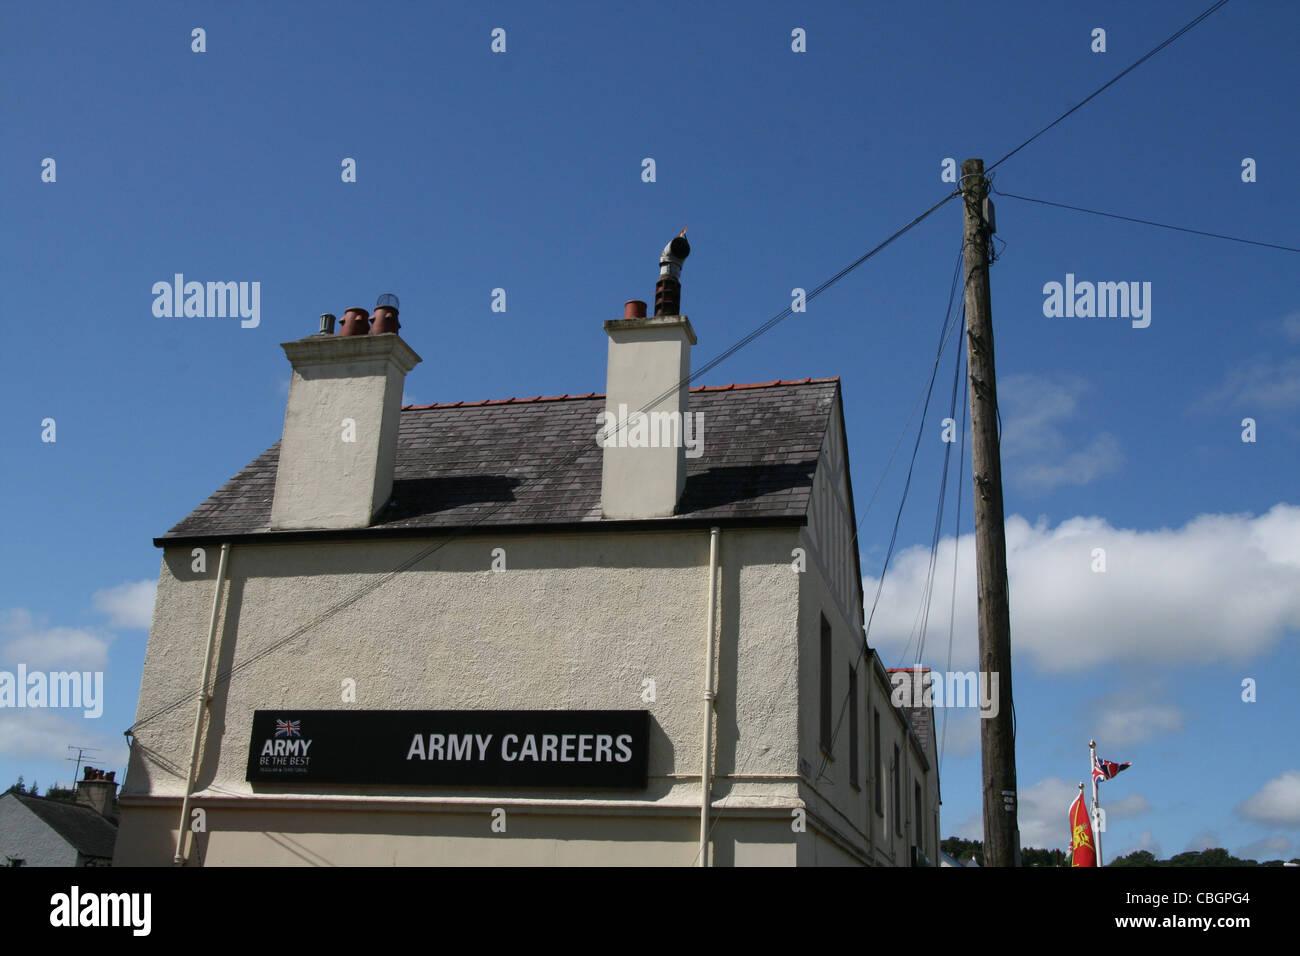 british army careers office in bangor wales great britain uk - Stock Image